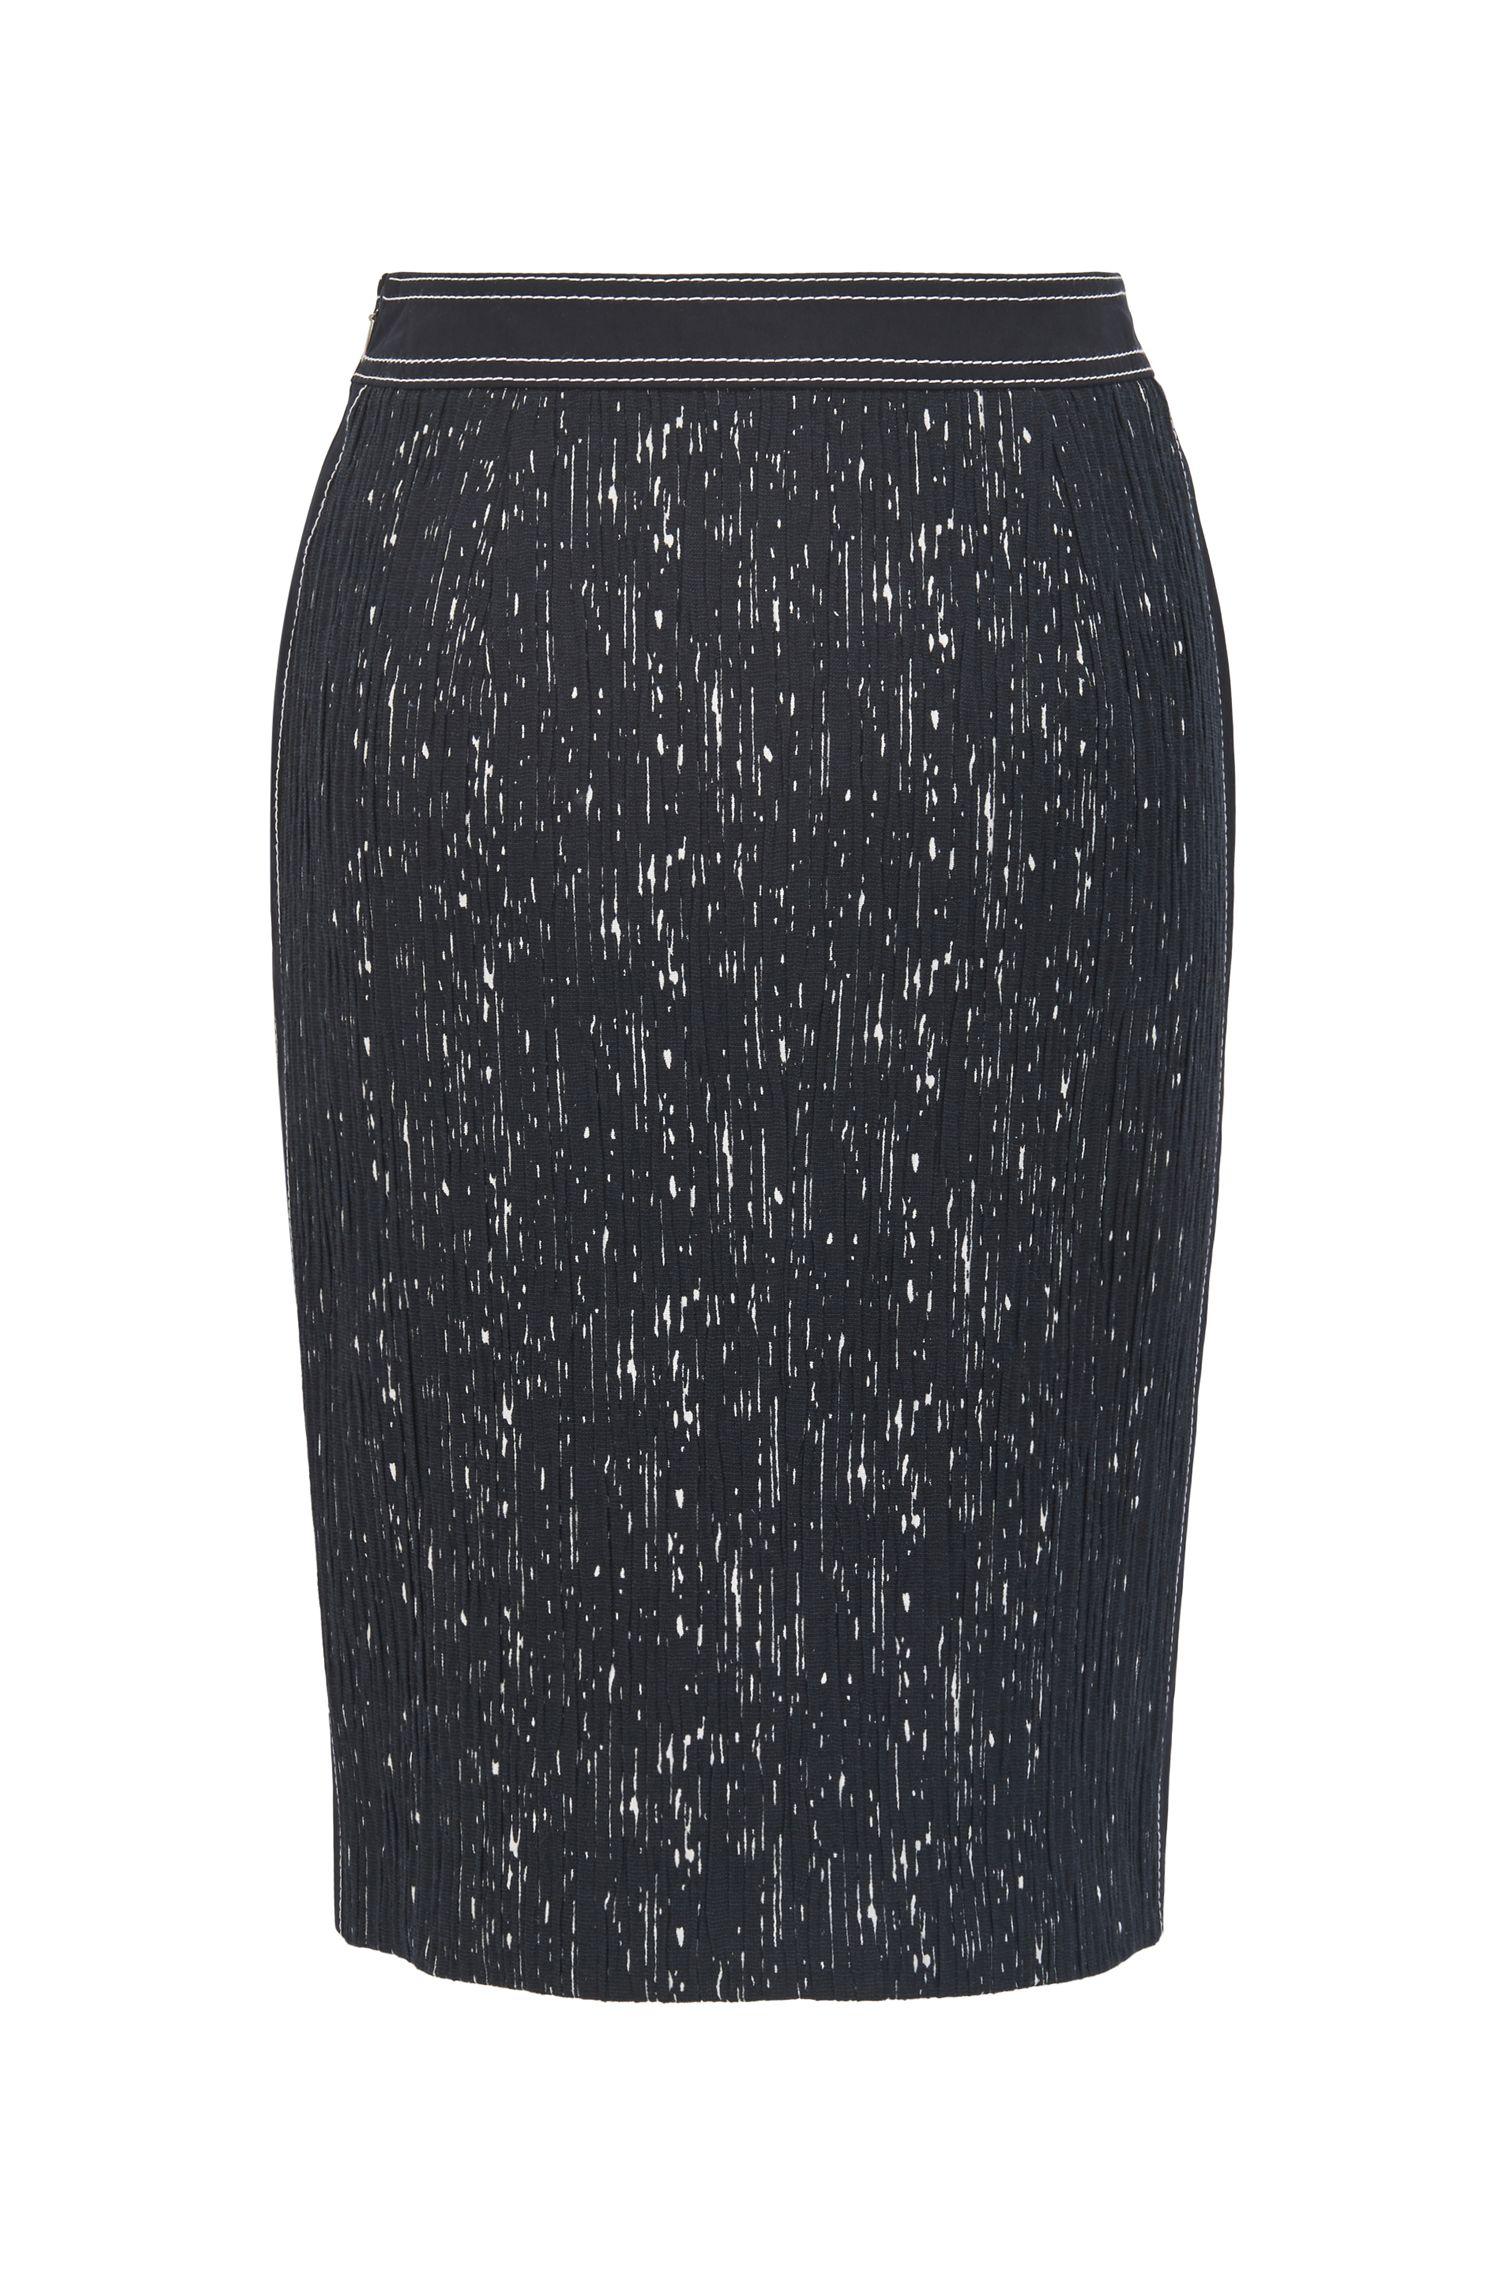 Patterned Plissé Pencil Skirt | Veleara, Patterned